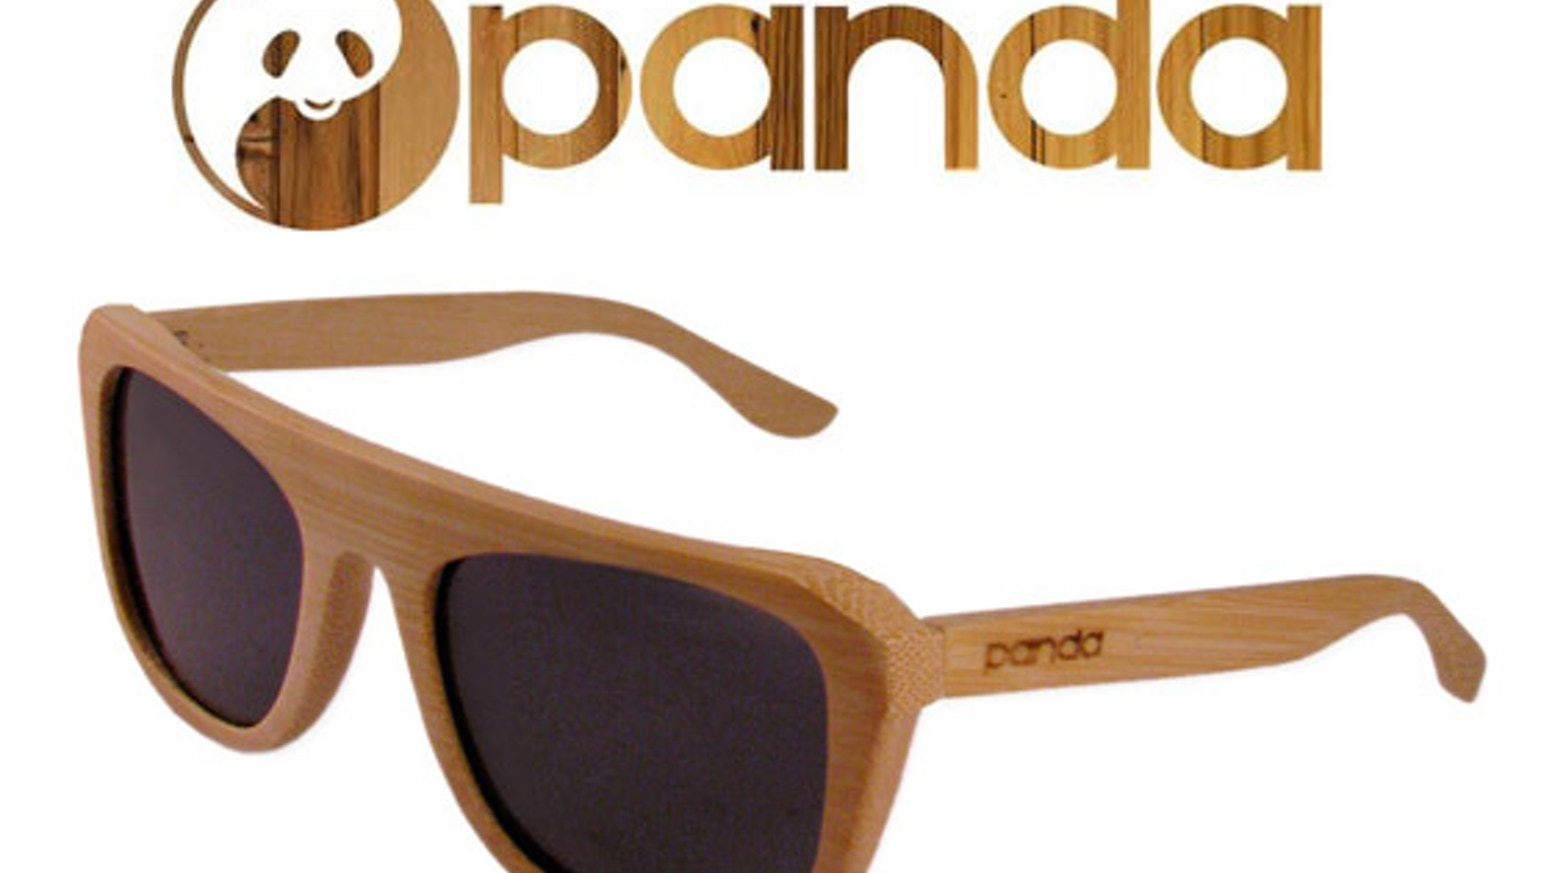 a1e0eafbed PANDA: Eco-friendly Handmade Bamboo Sunglasses by Vincent Ko ...